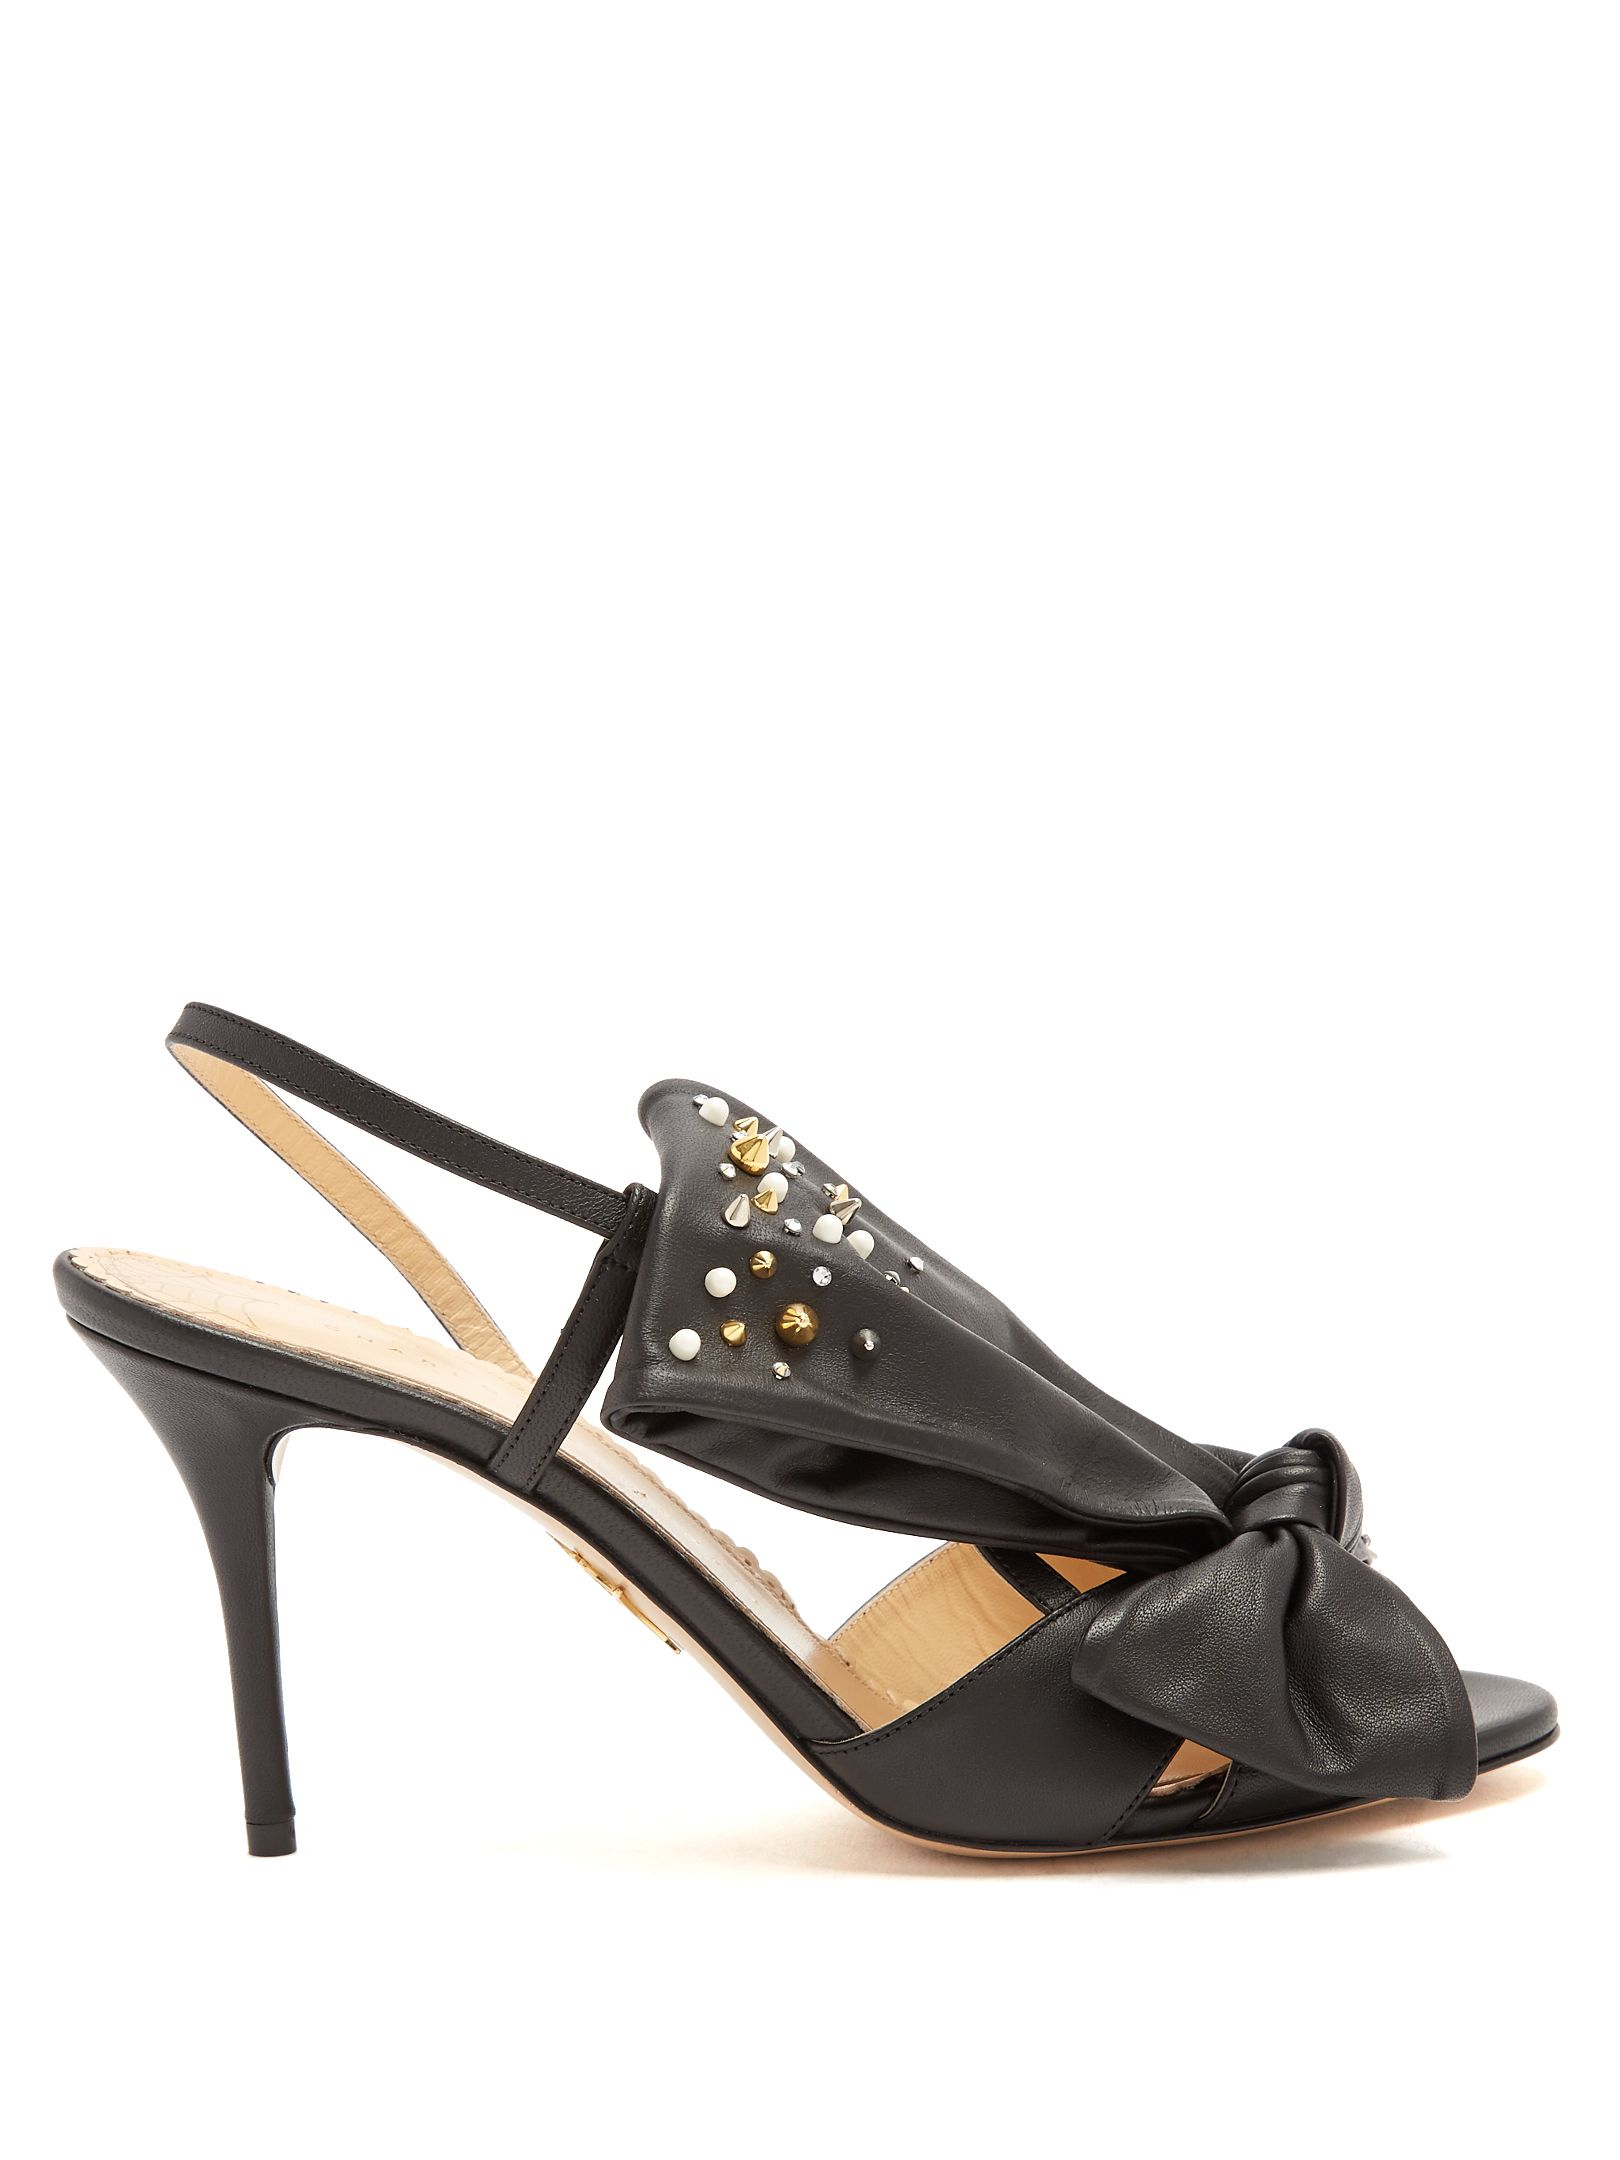 Buy Cheap Original Sale View Charlotte Olympia Georgina bow-embellishment leather sandals F1q1Ec